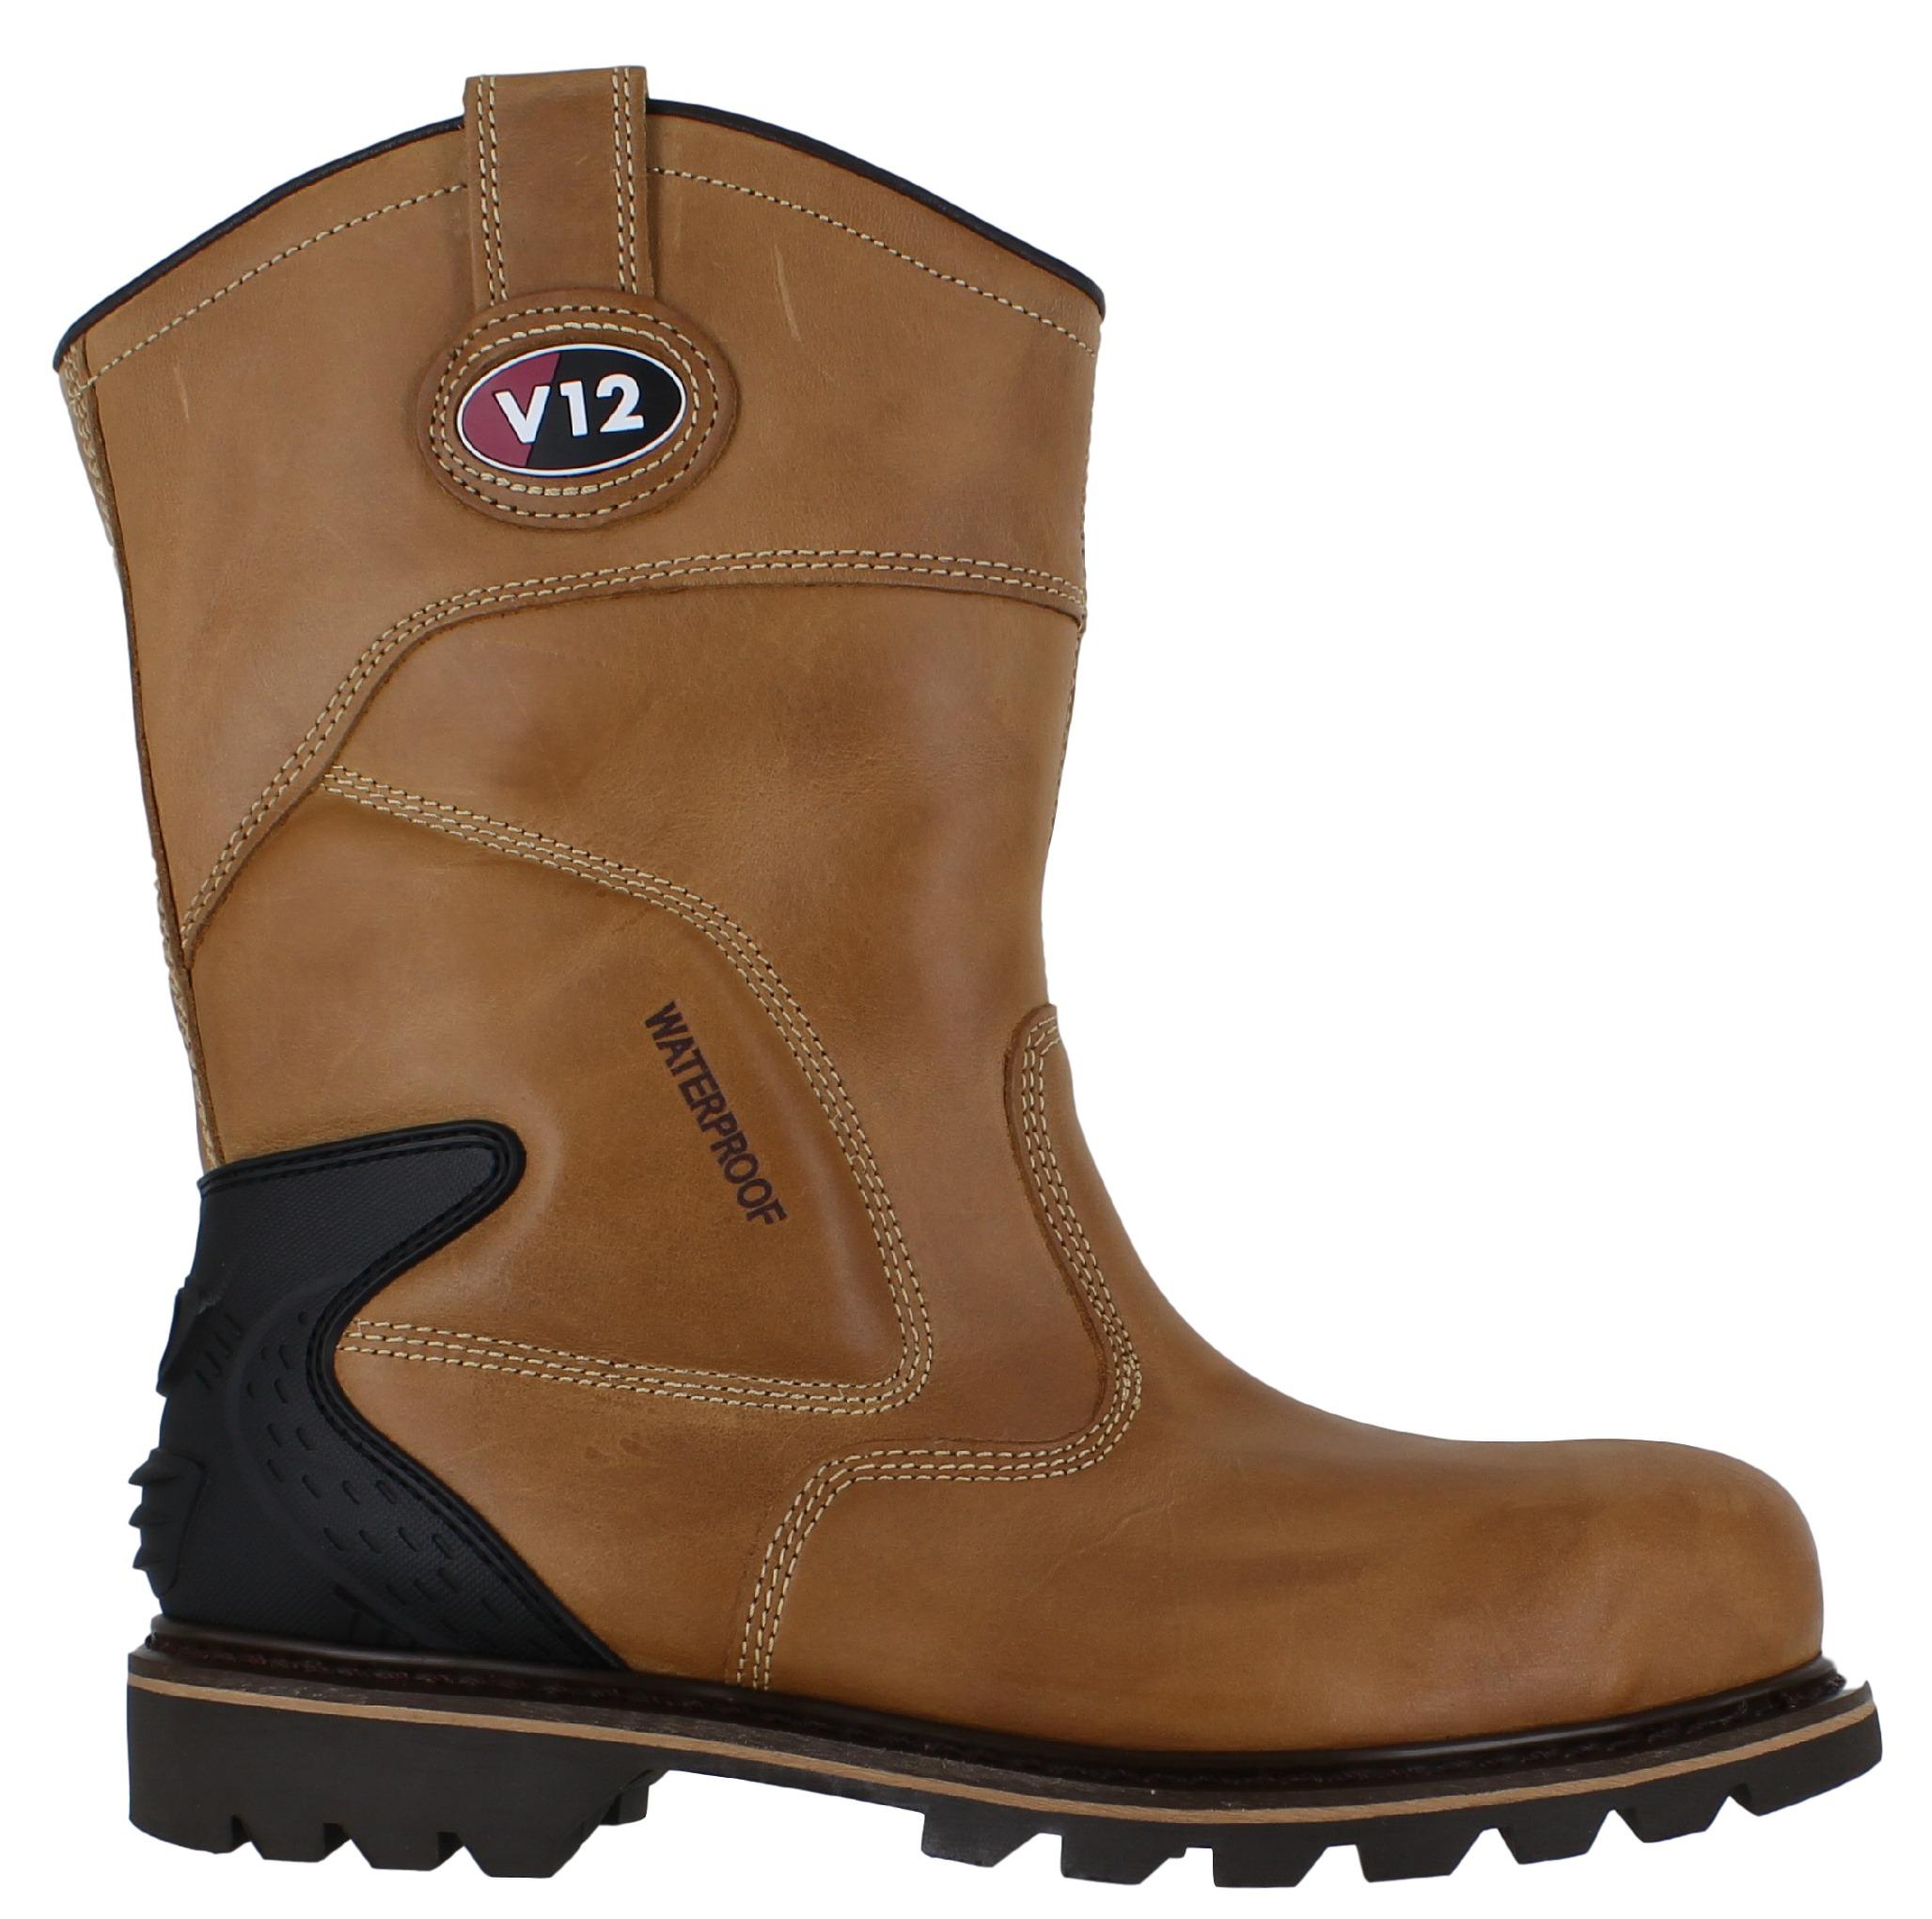 V12 Best Mens Steel Toe Waterproof Safety Rigger Work ...